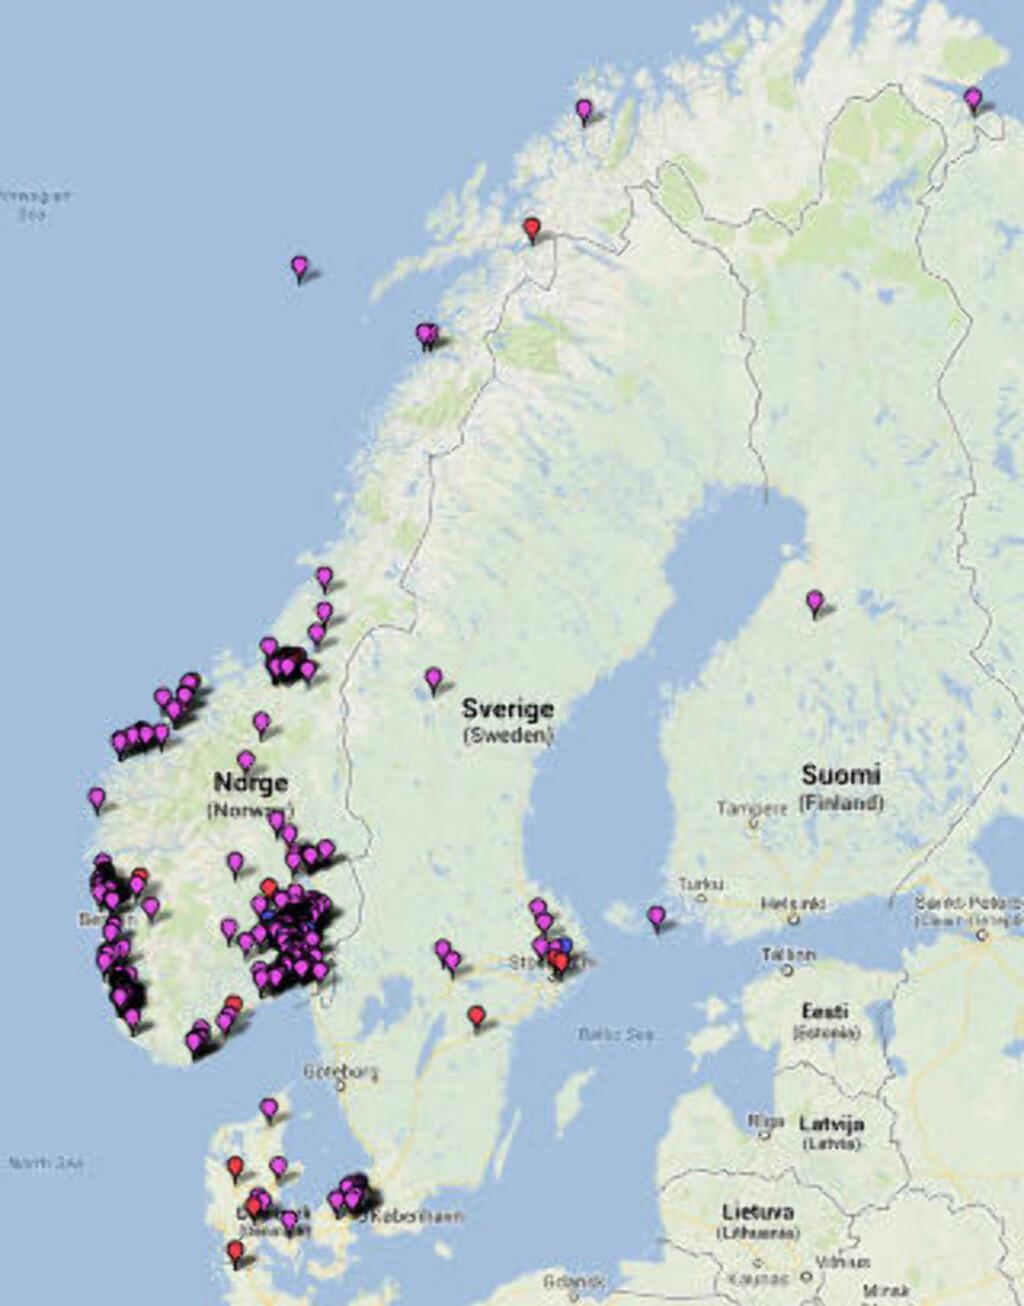 lan i sverige bor i norge